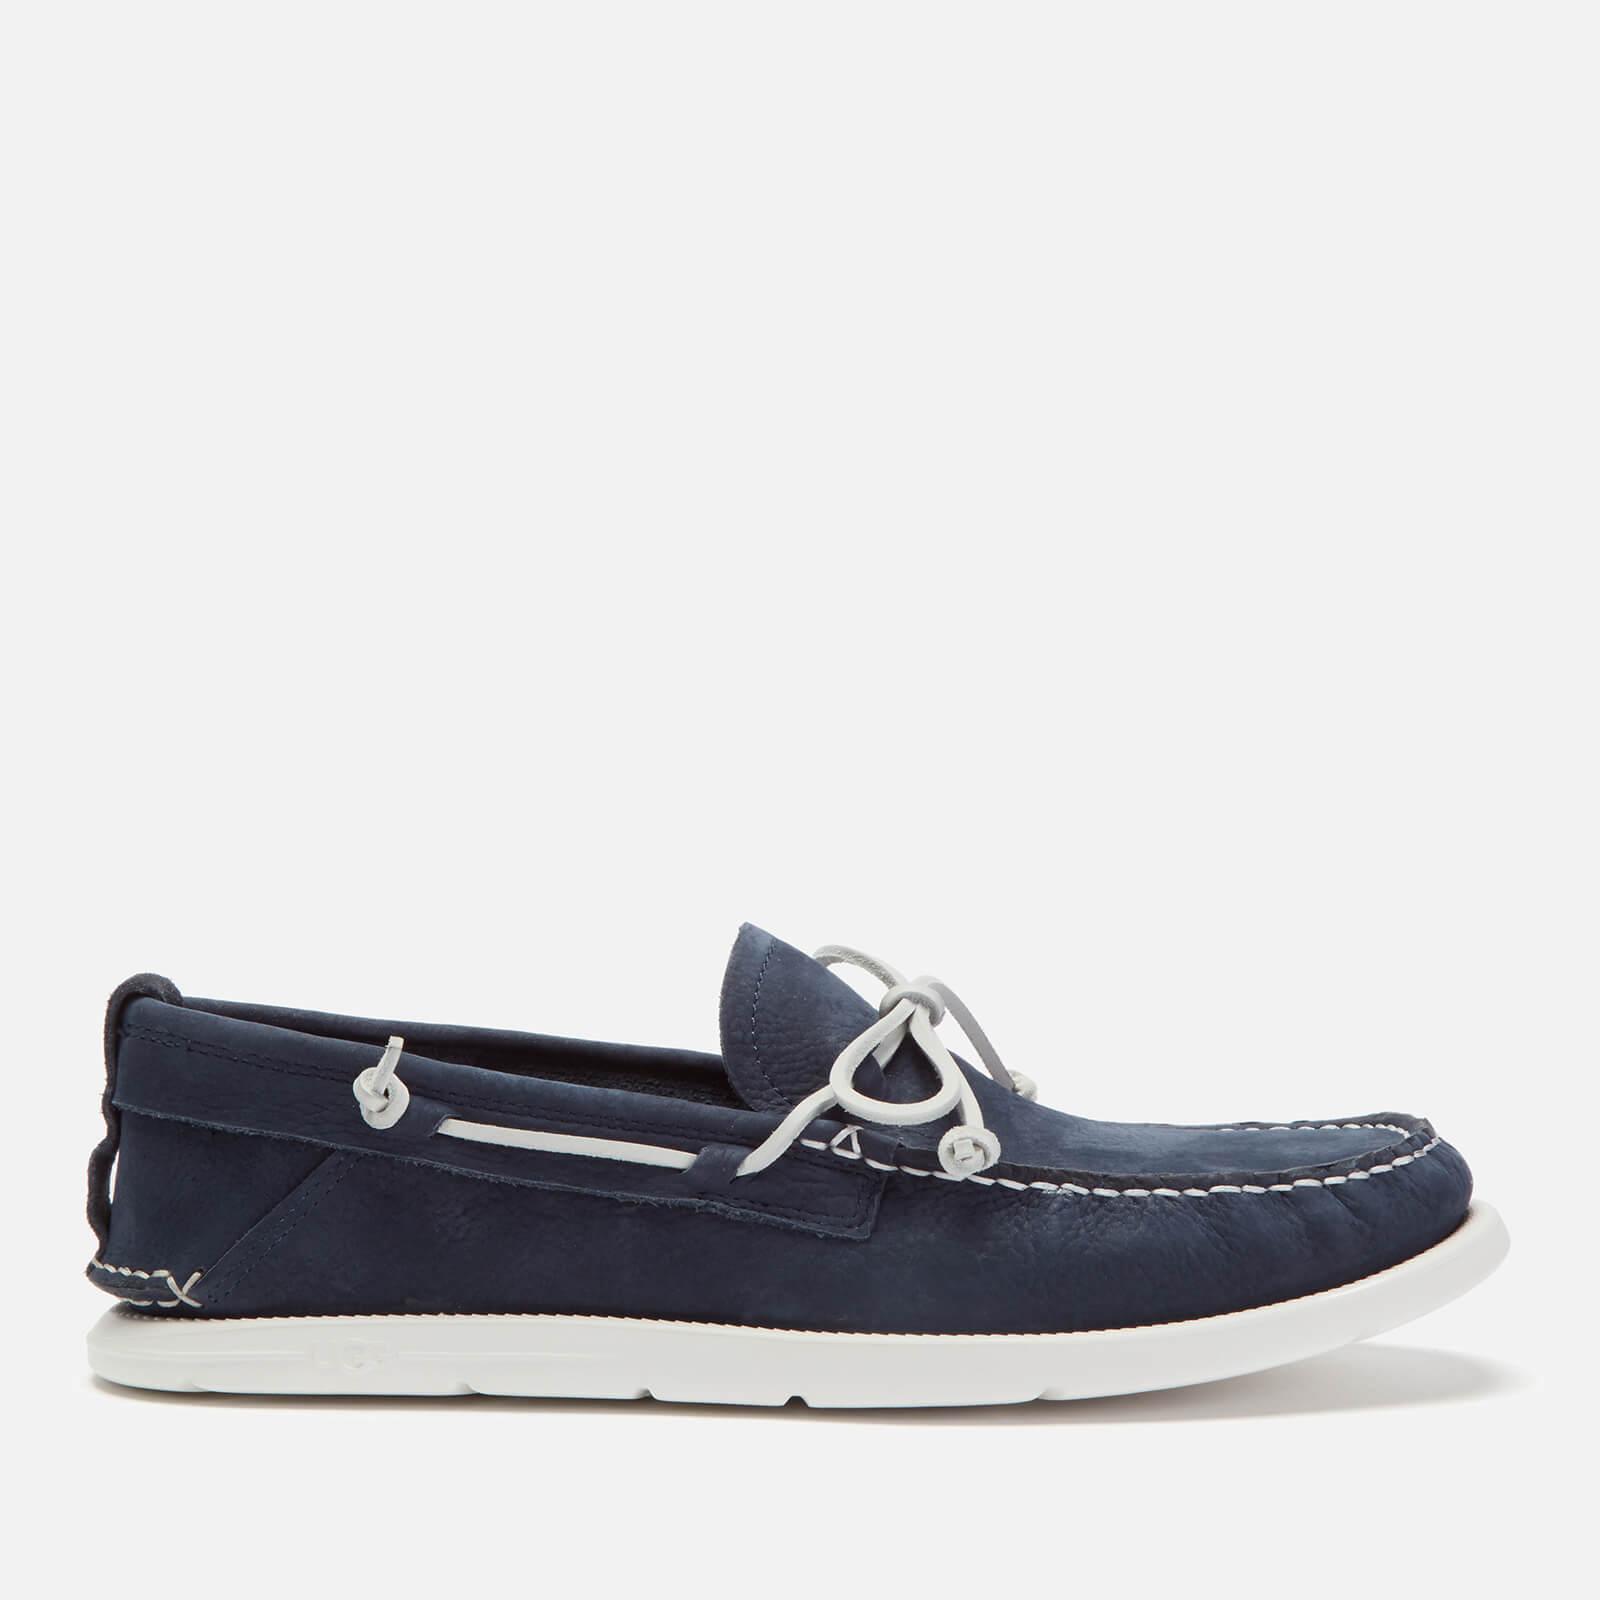 UGG Men's Beach Moc Slip-On Boat Shoes - True Navy - UK 7